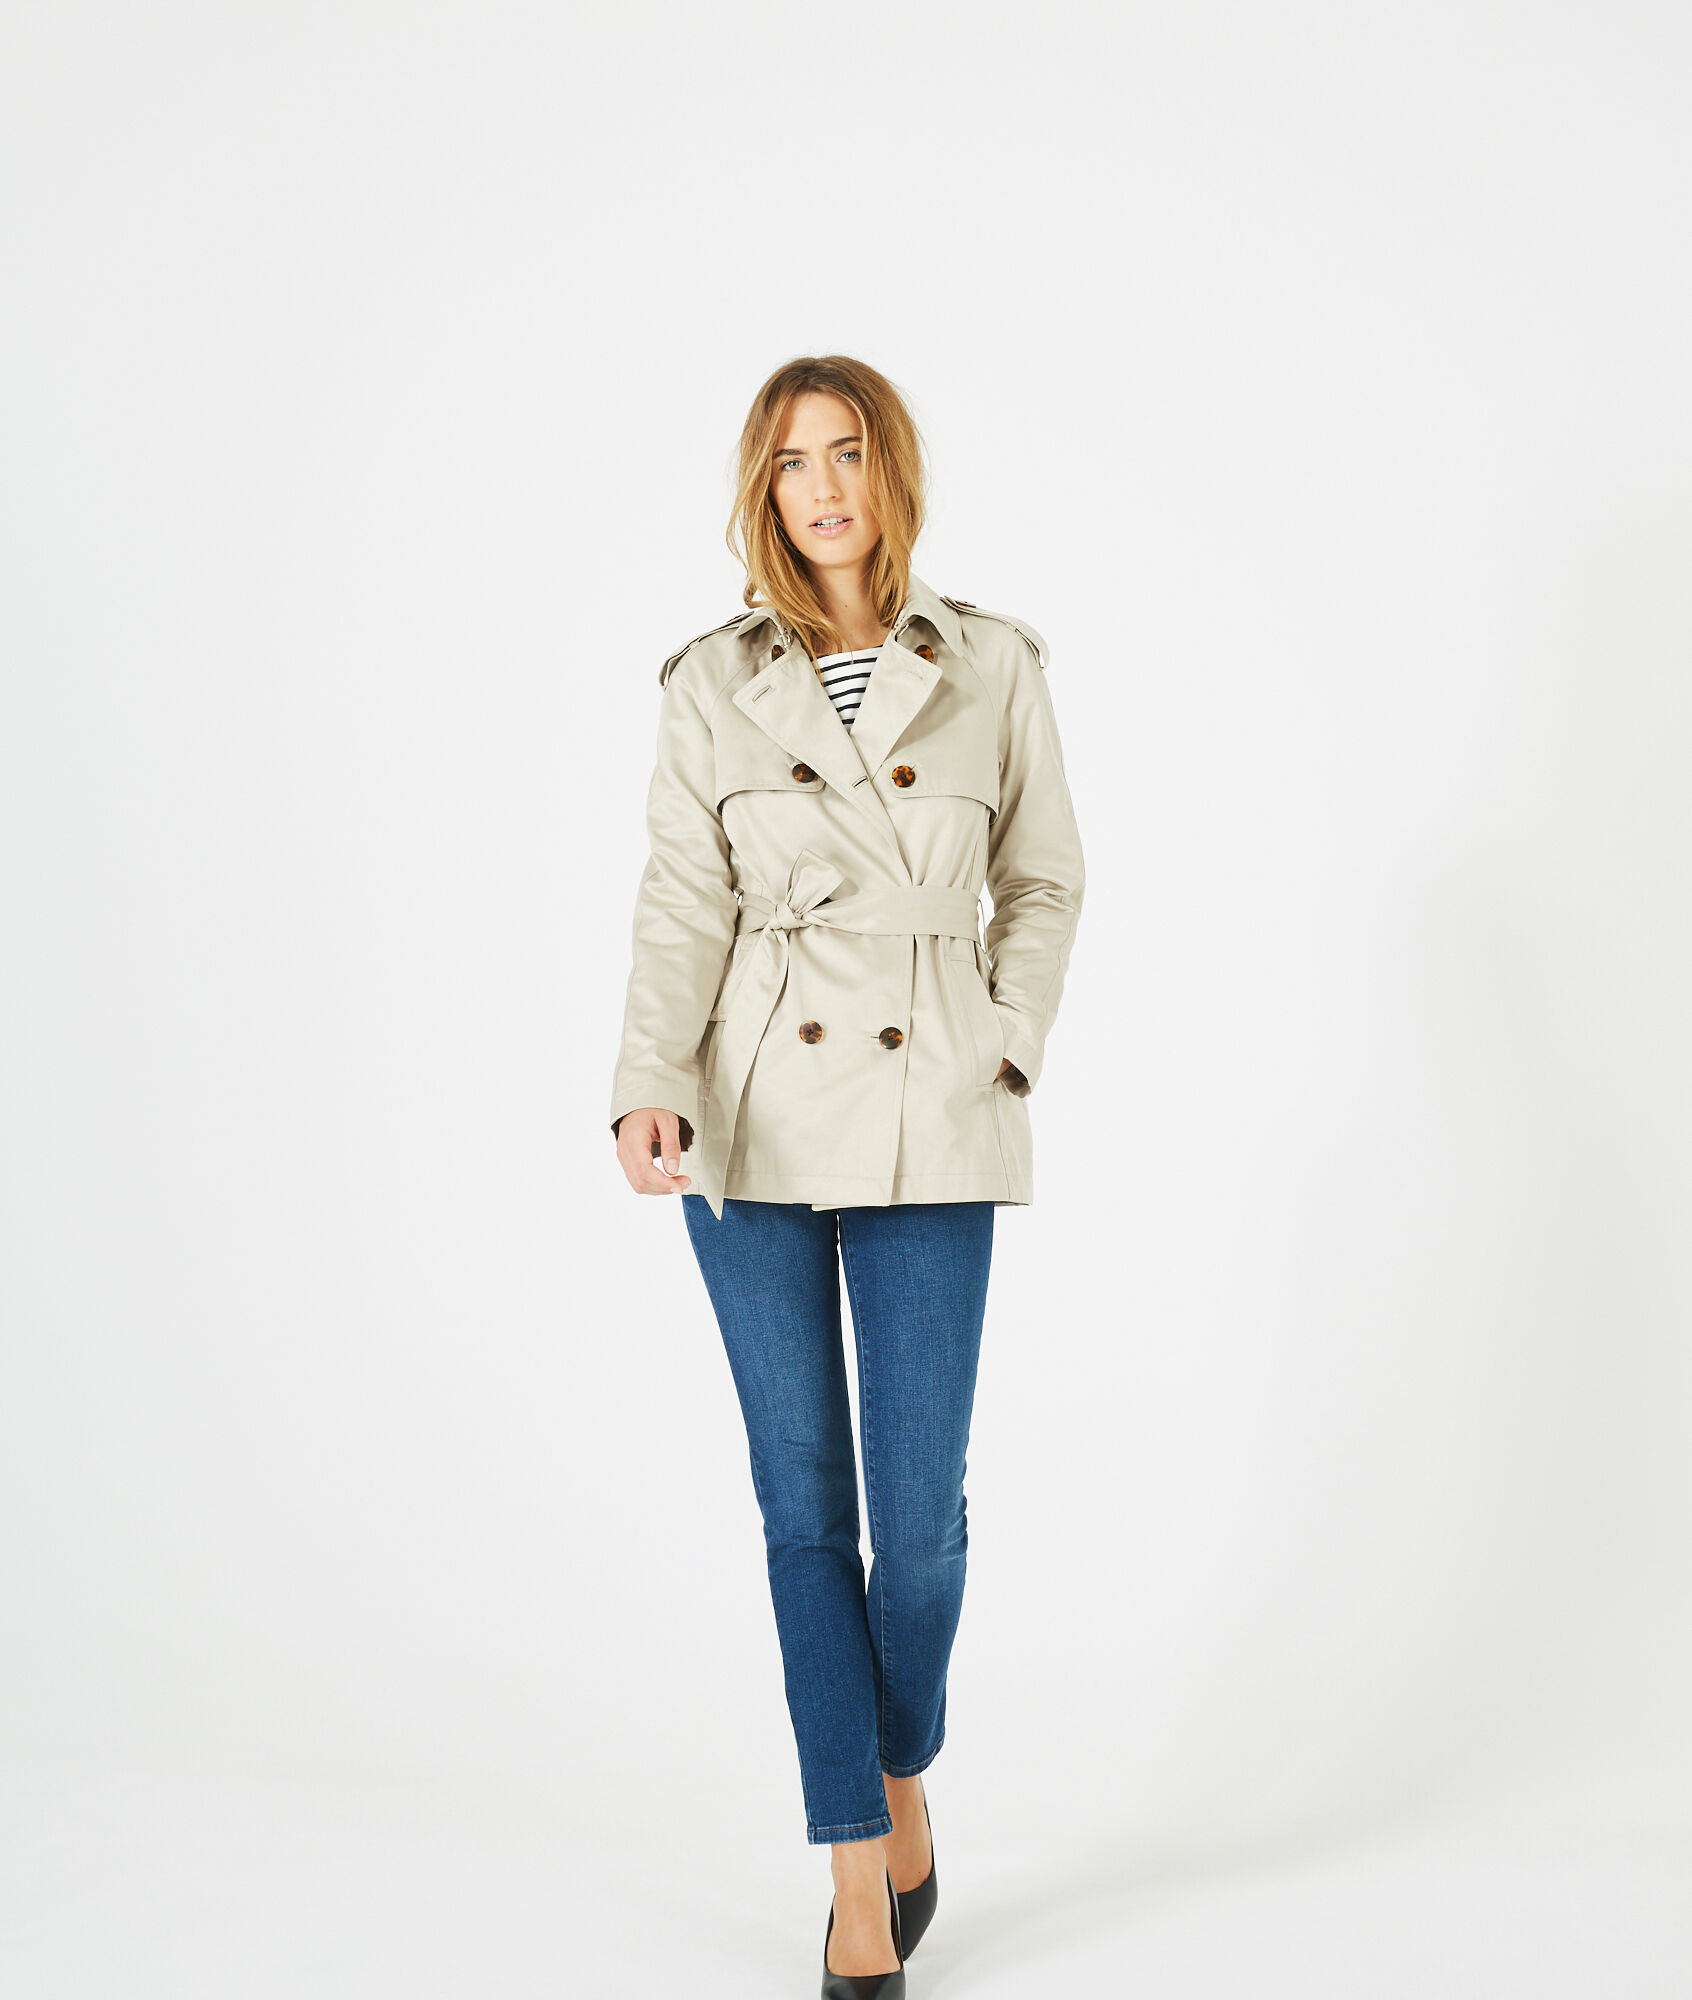 Jeanne short cream trench coat - 123